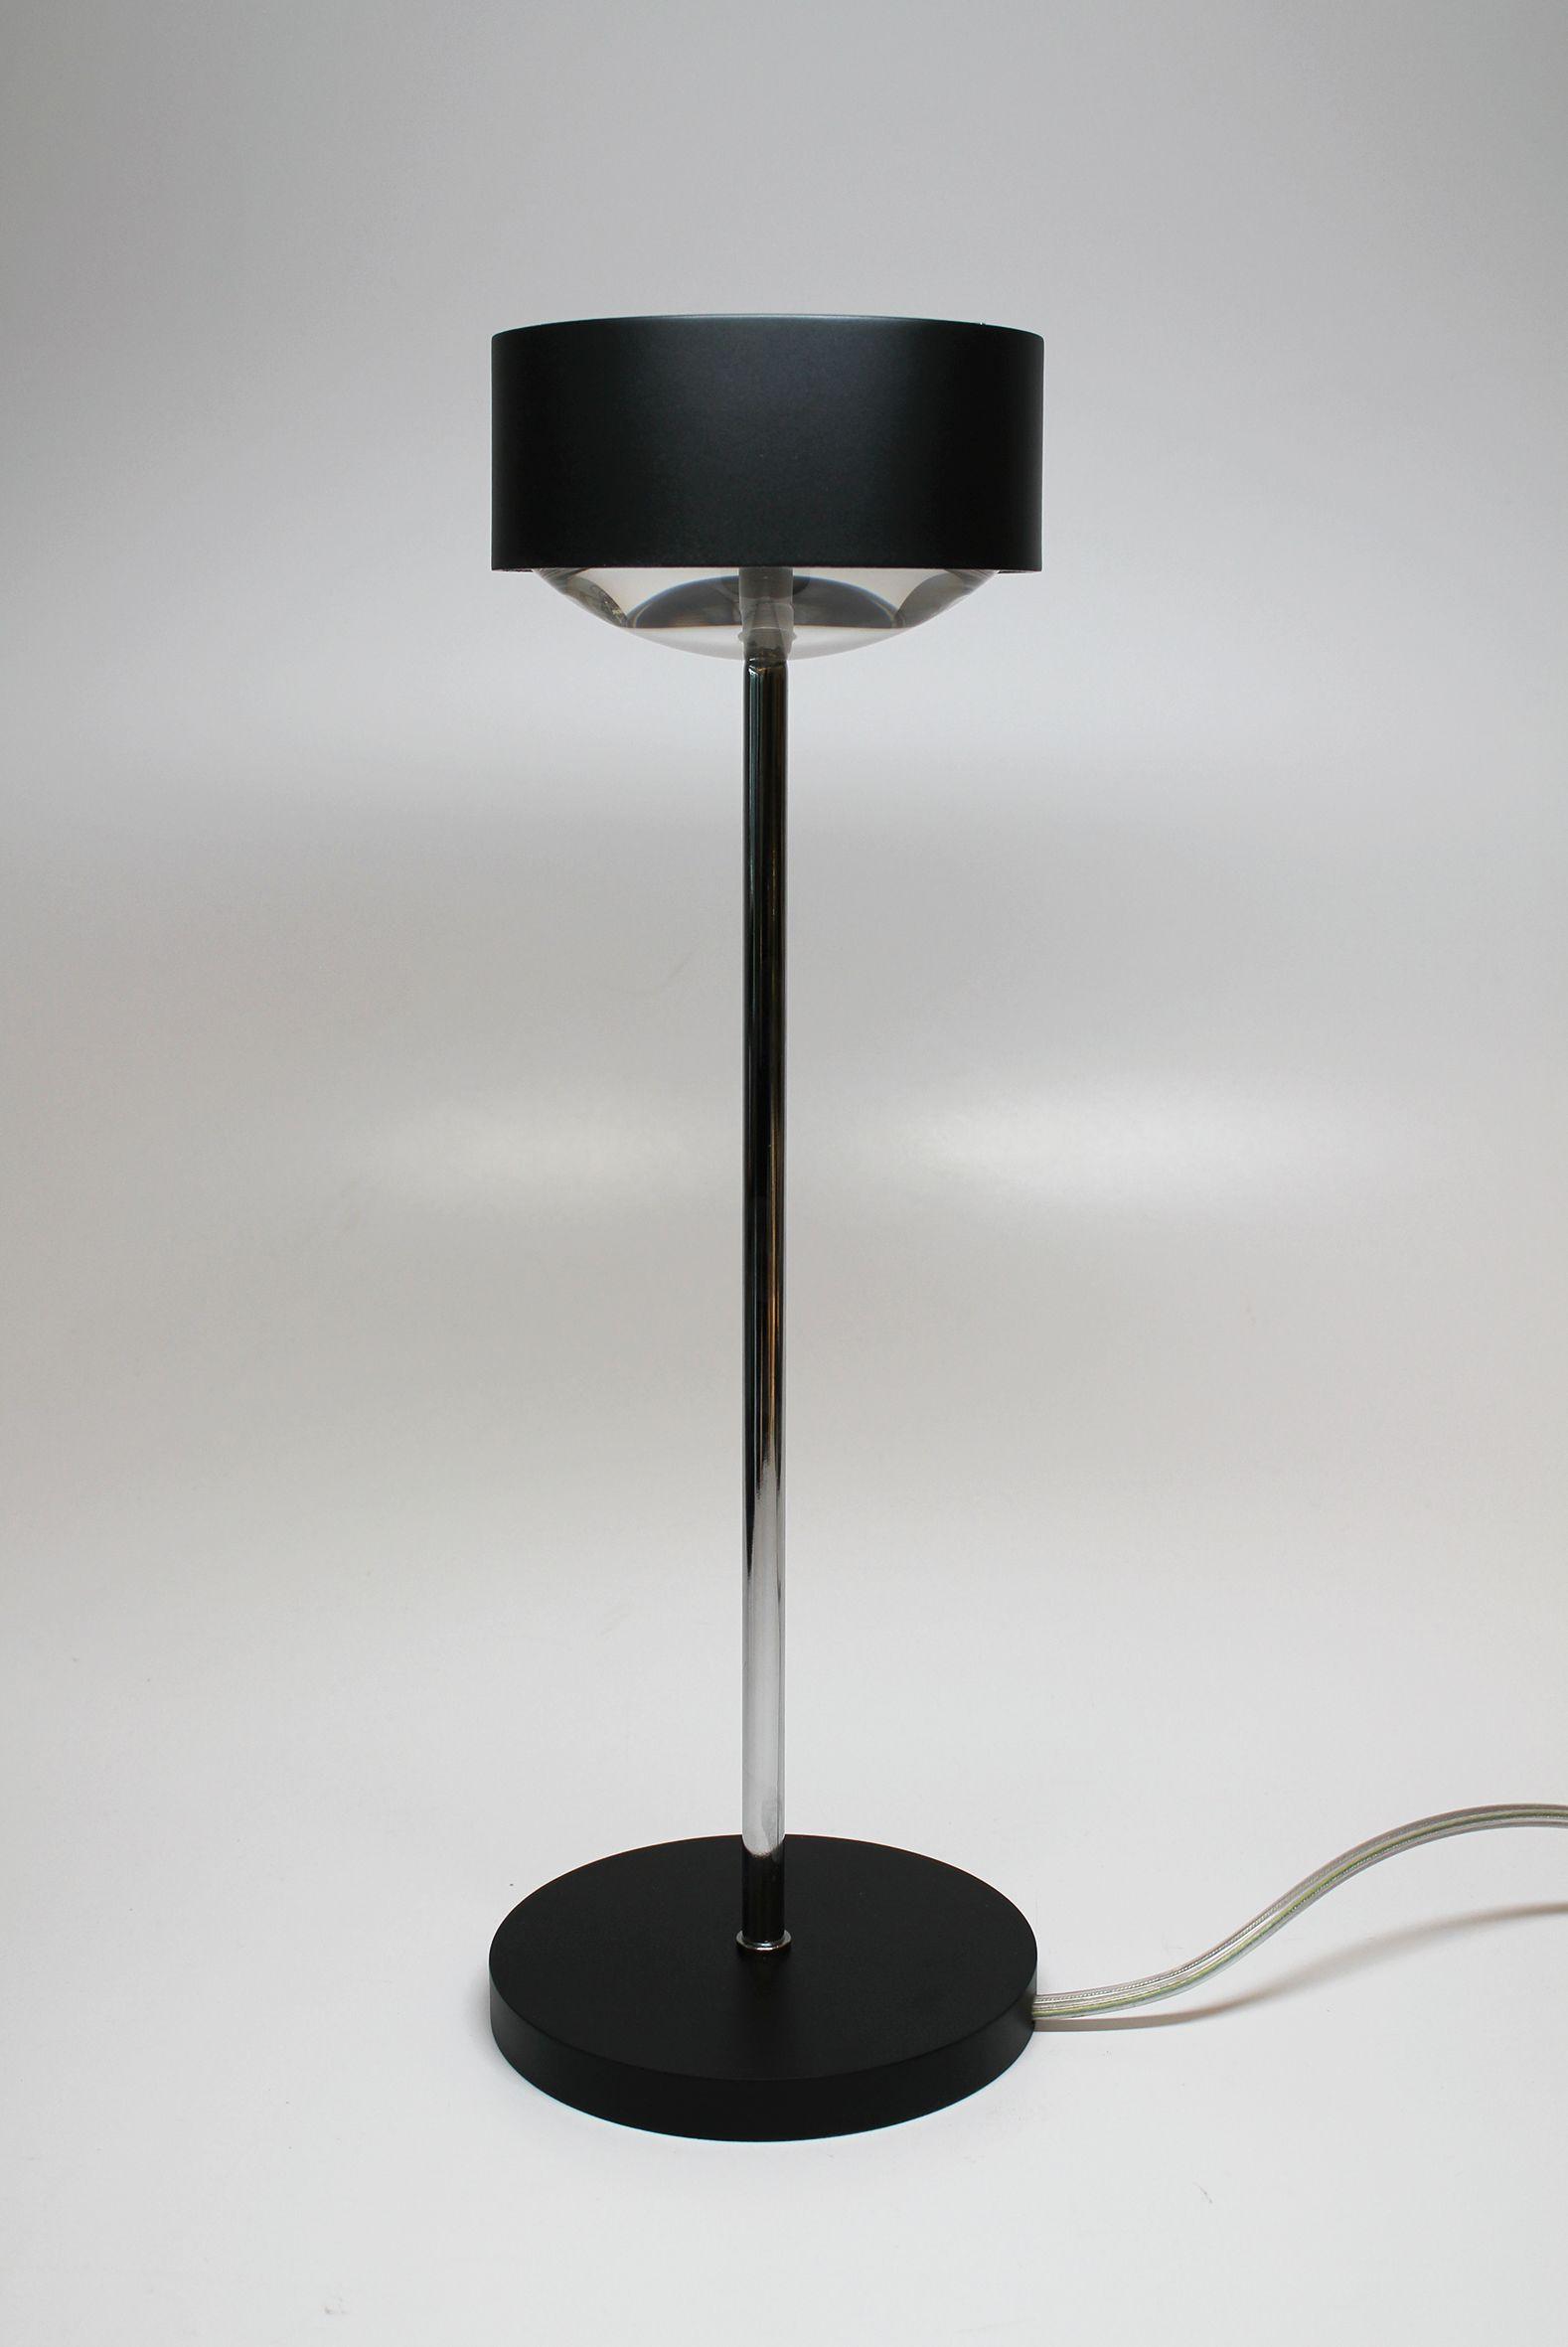 Top Light Leuchten Artikel von Top Light Leuchten Puk Maxx Eye Table + LED / groß 6-384705